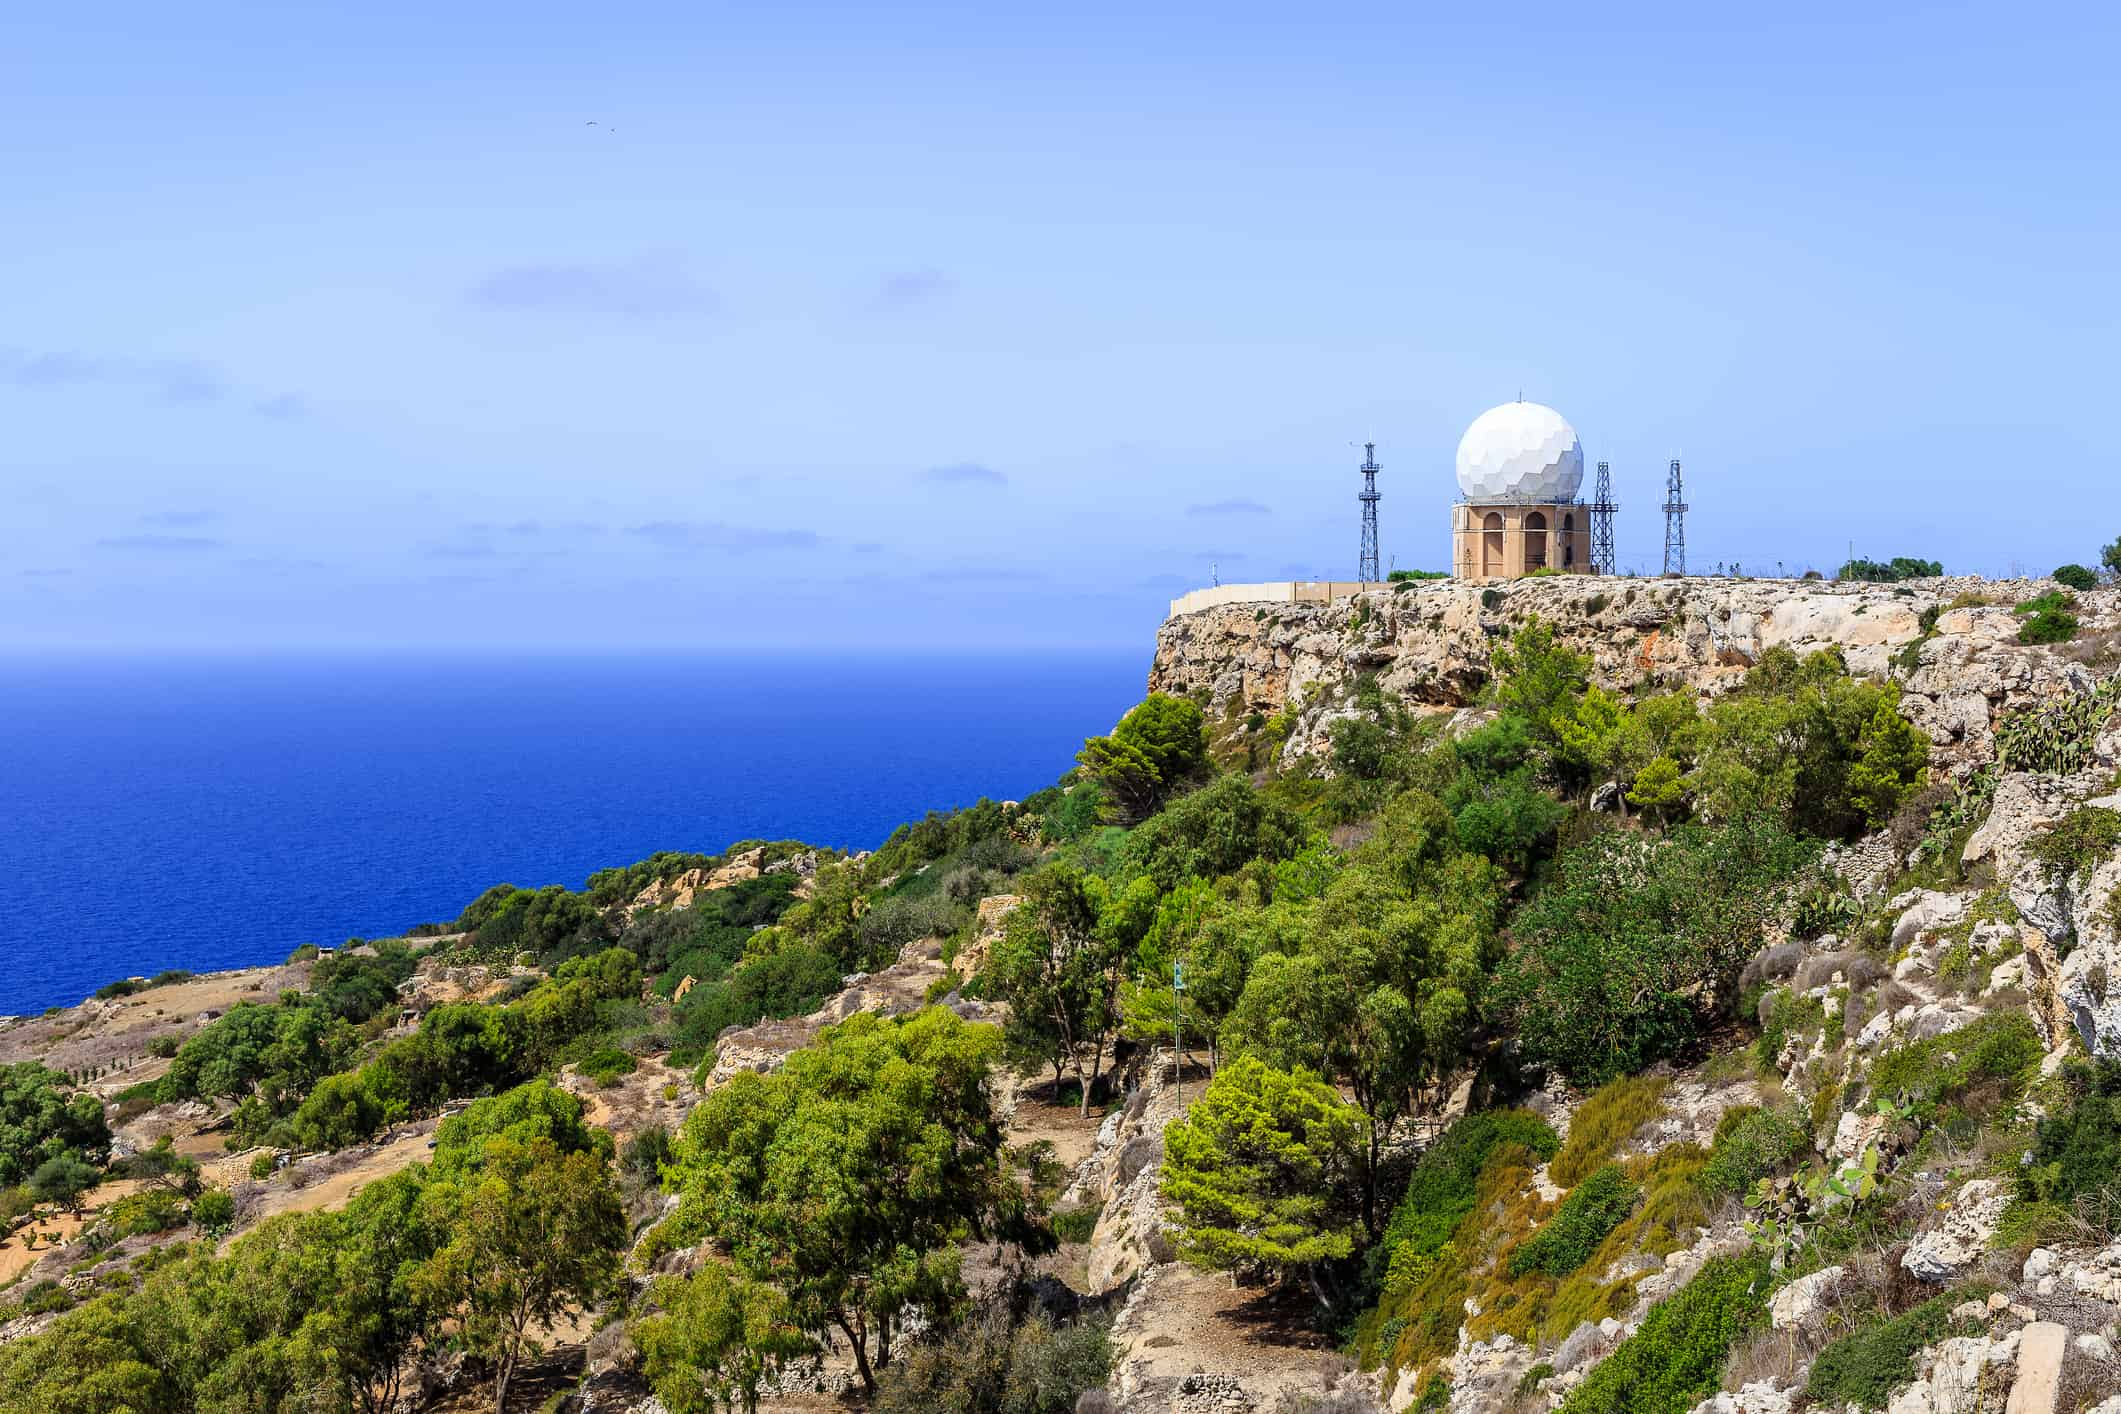 Dingli Cliffs, Malta - Risskov Rejser